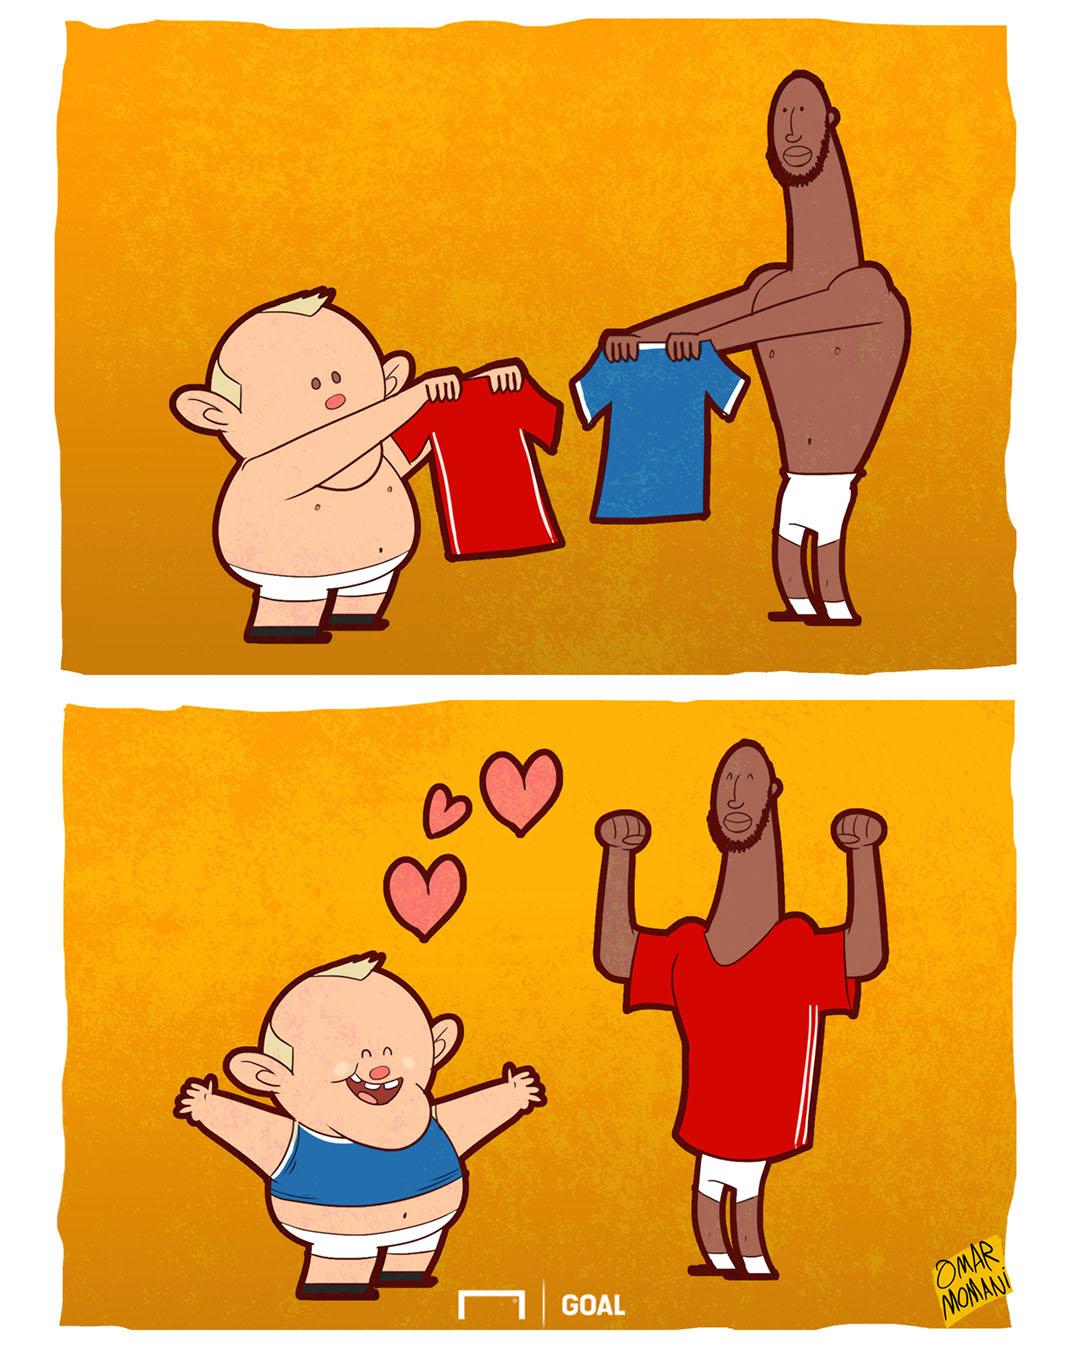 Wayne Rooney Romelu Lukaku cartoon